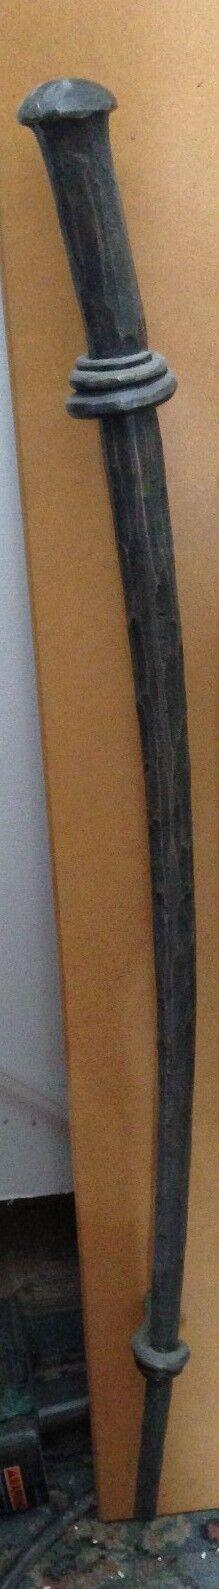 Du Verre Hardware OverGrößed Pulls Large Brass Handle Antique Brass FC14-LAB